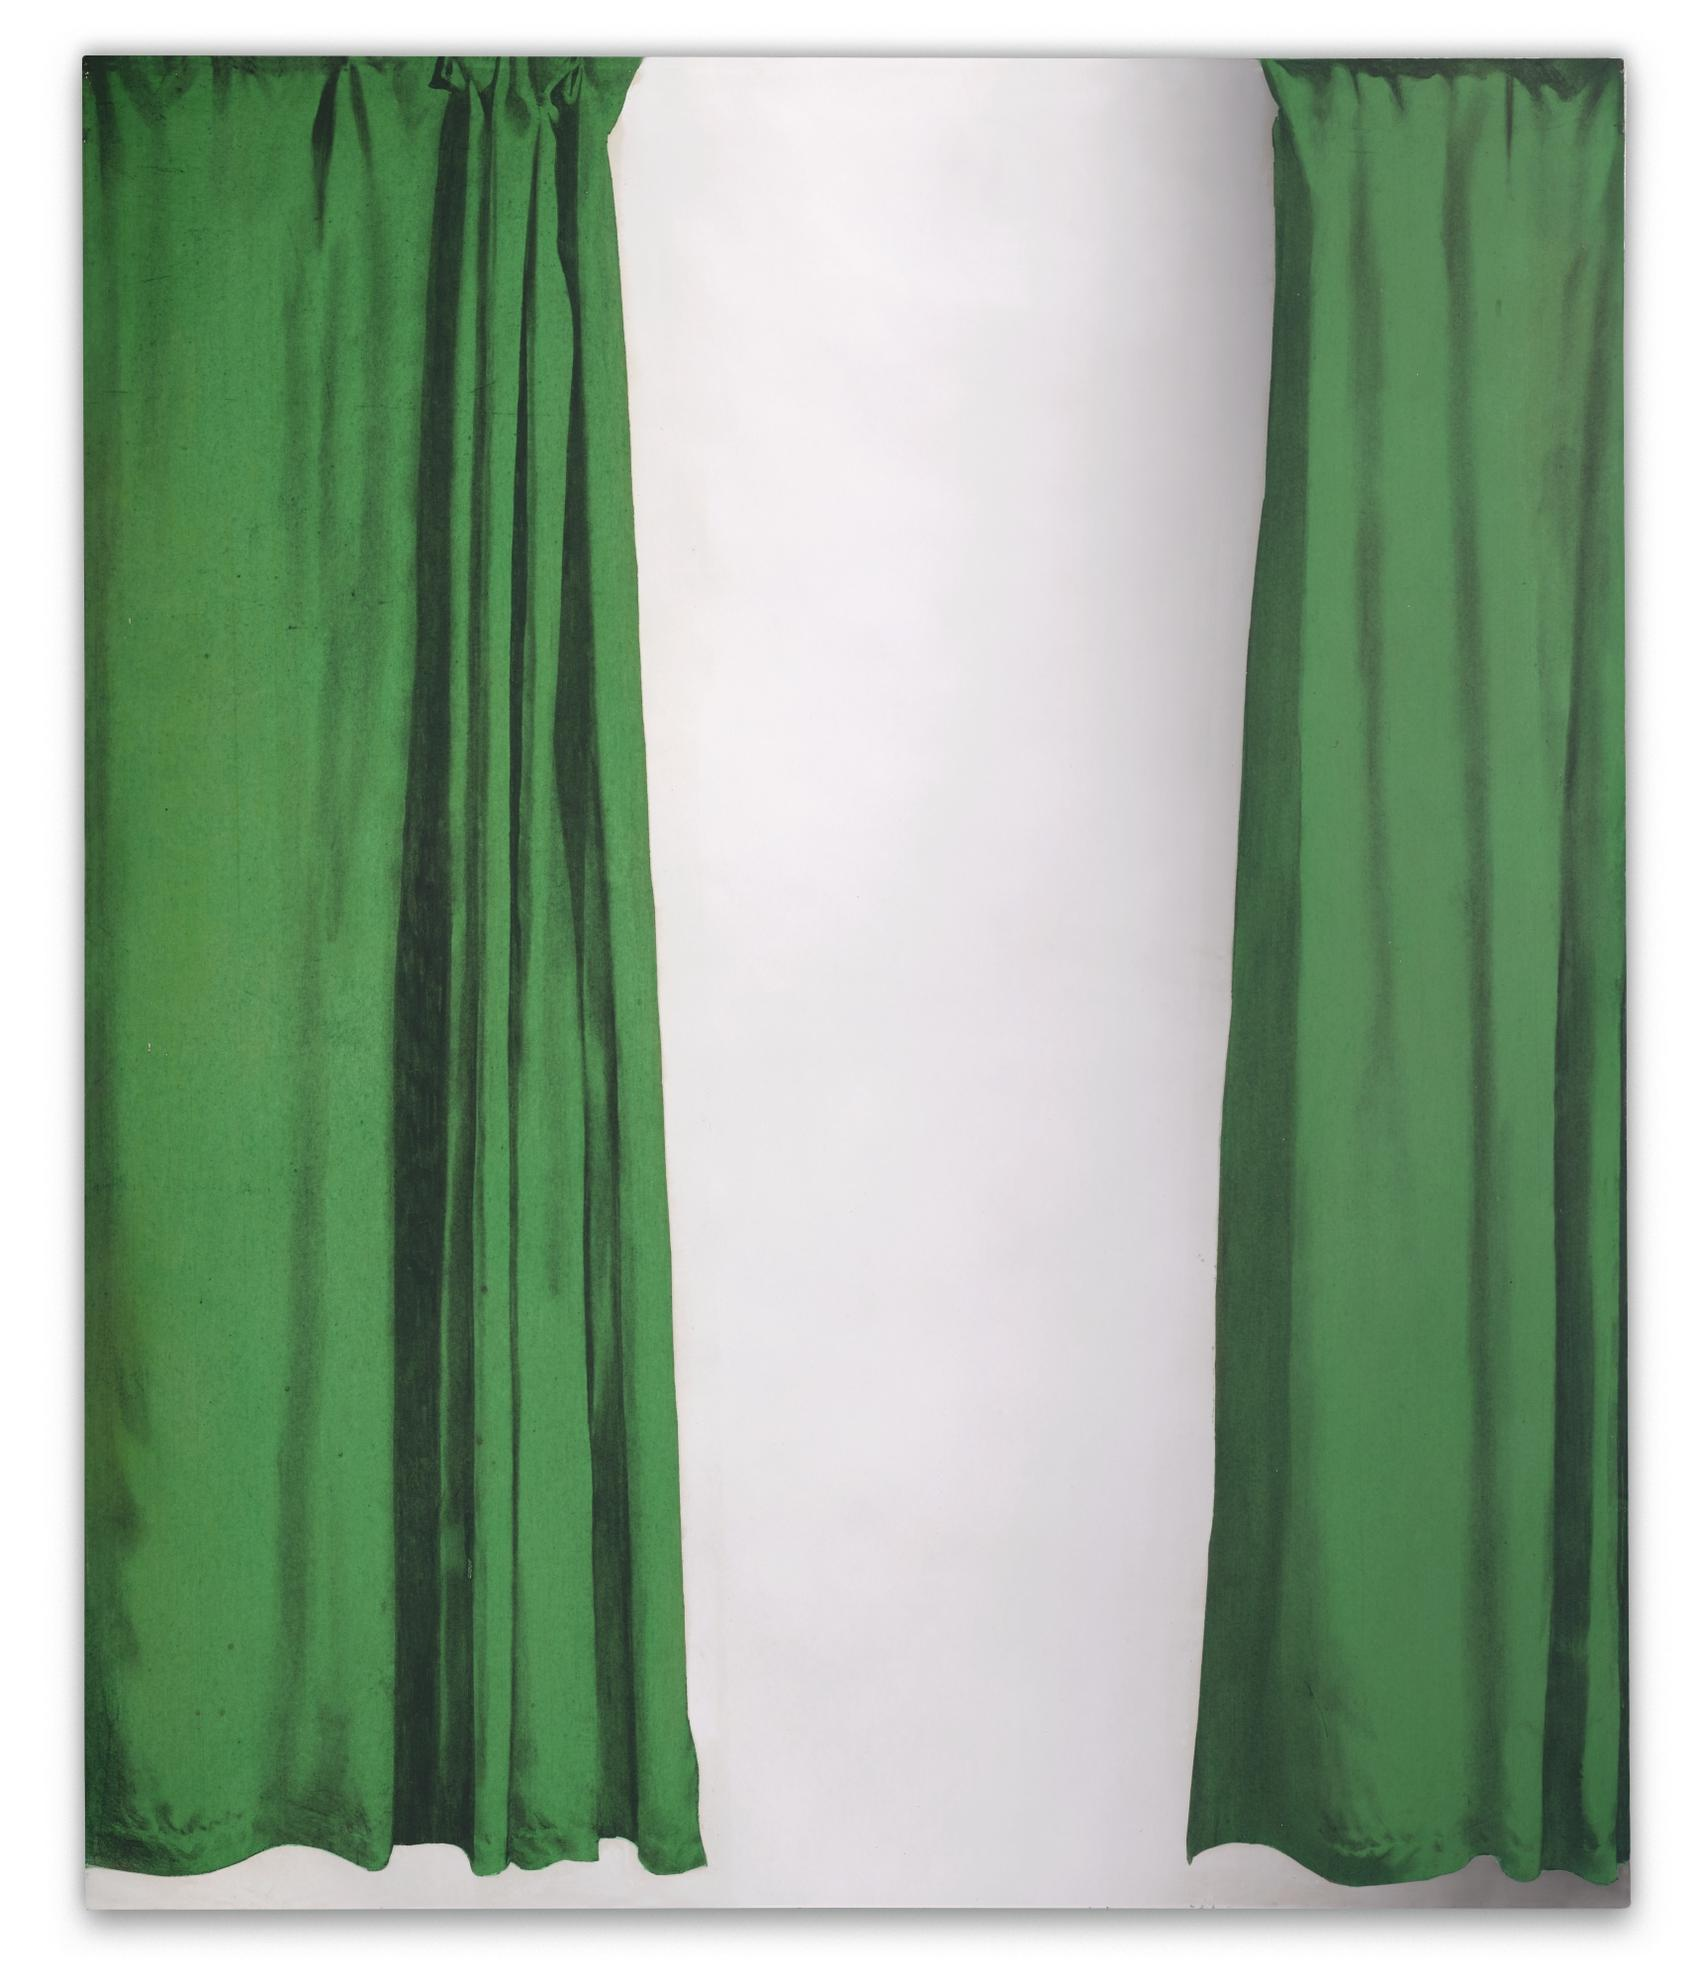 Michelangelo Pistoletto-Tendine Verdi-1966